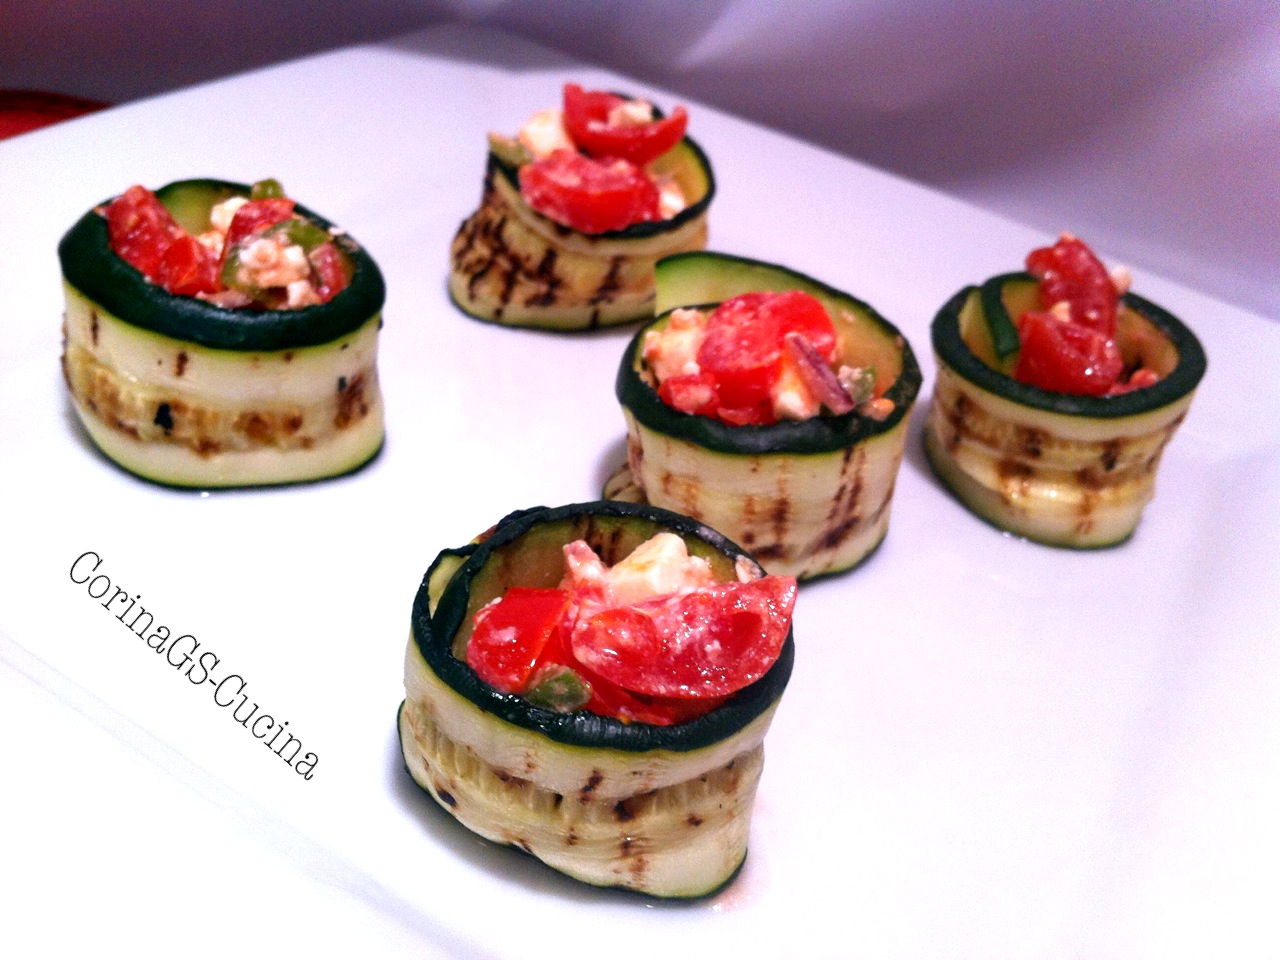 Maki di zucchine saporiti-Ricetta base zucchina-CorinaGS-Cucina